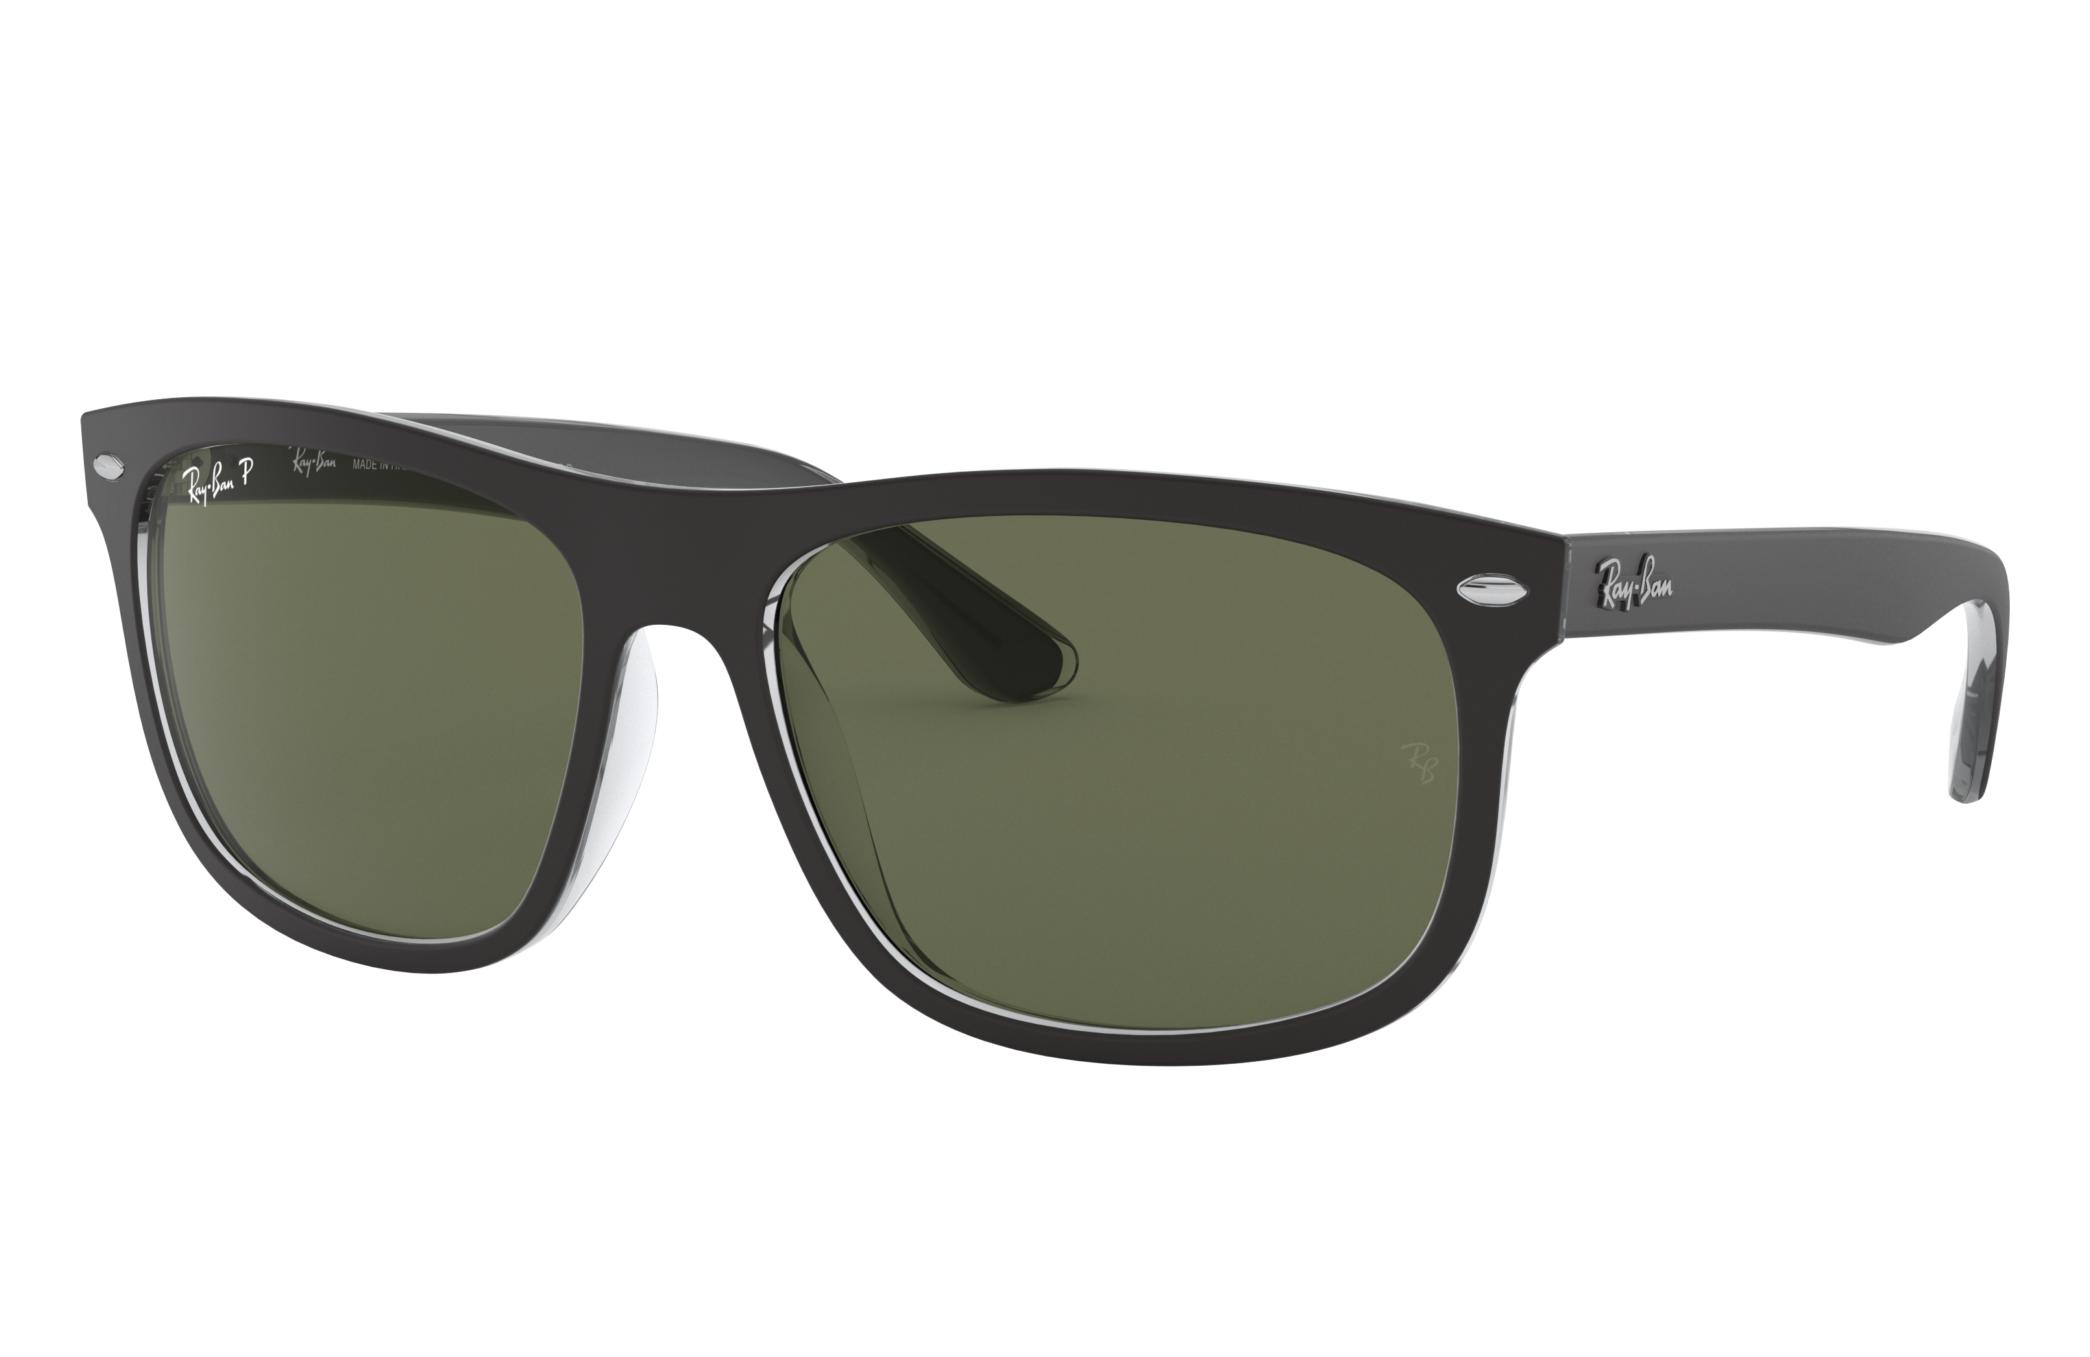 Ray-Ban Rb4226 Black, Polarized Green Lenses - RB4226